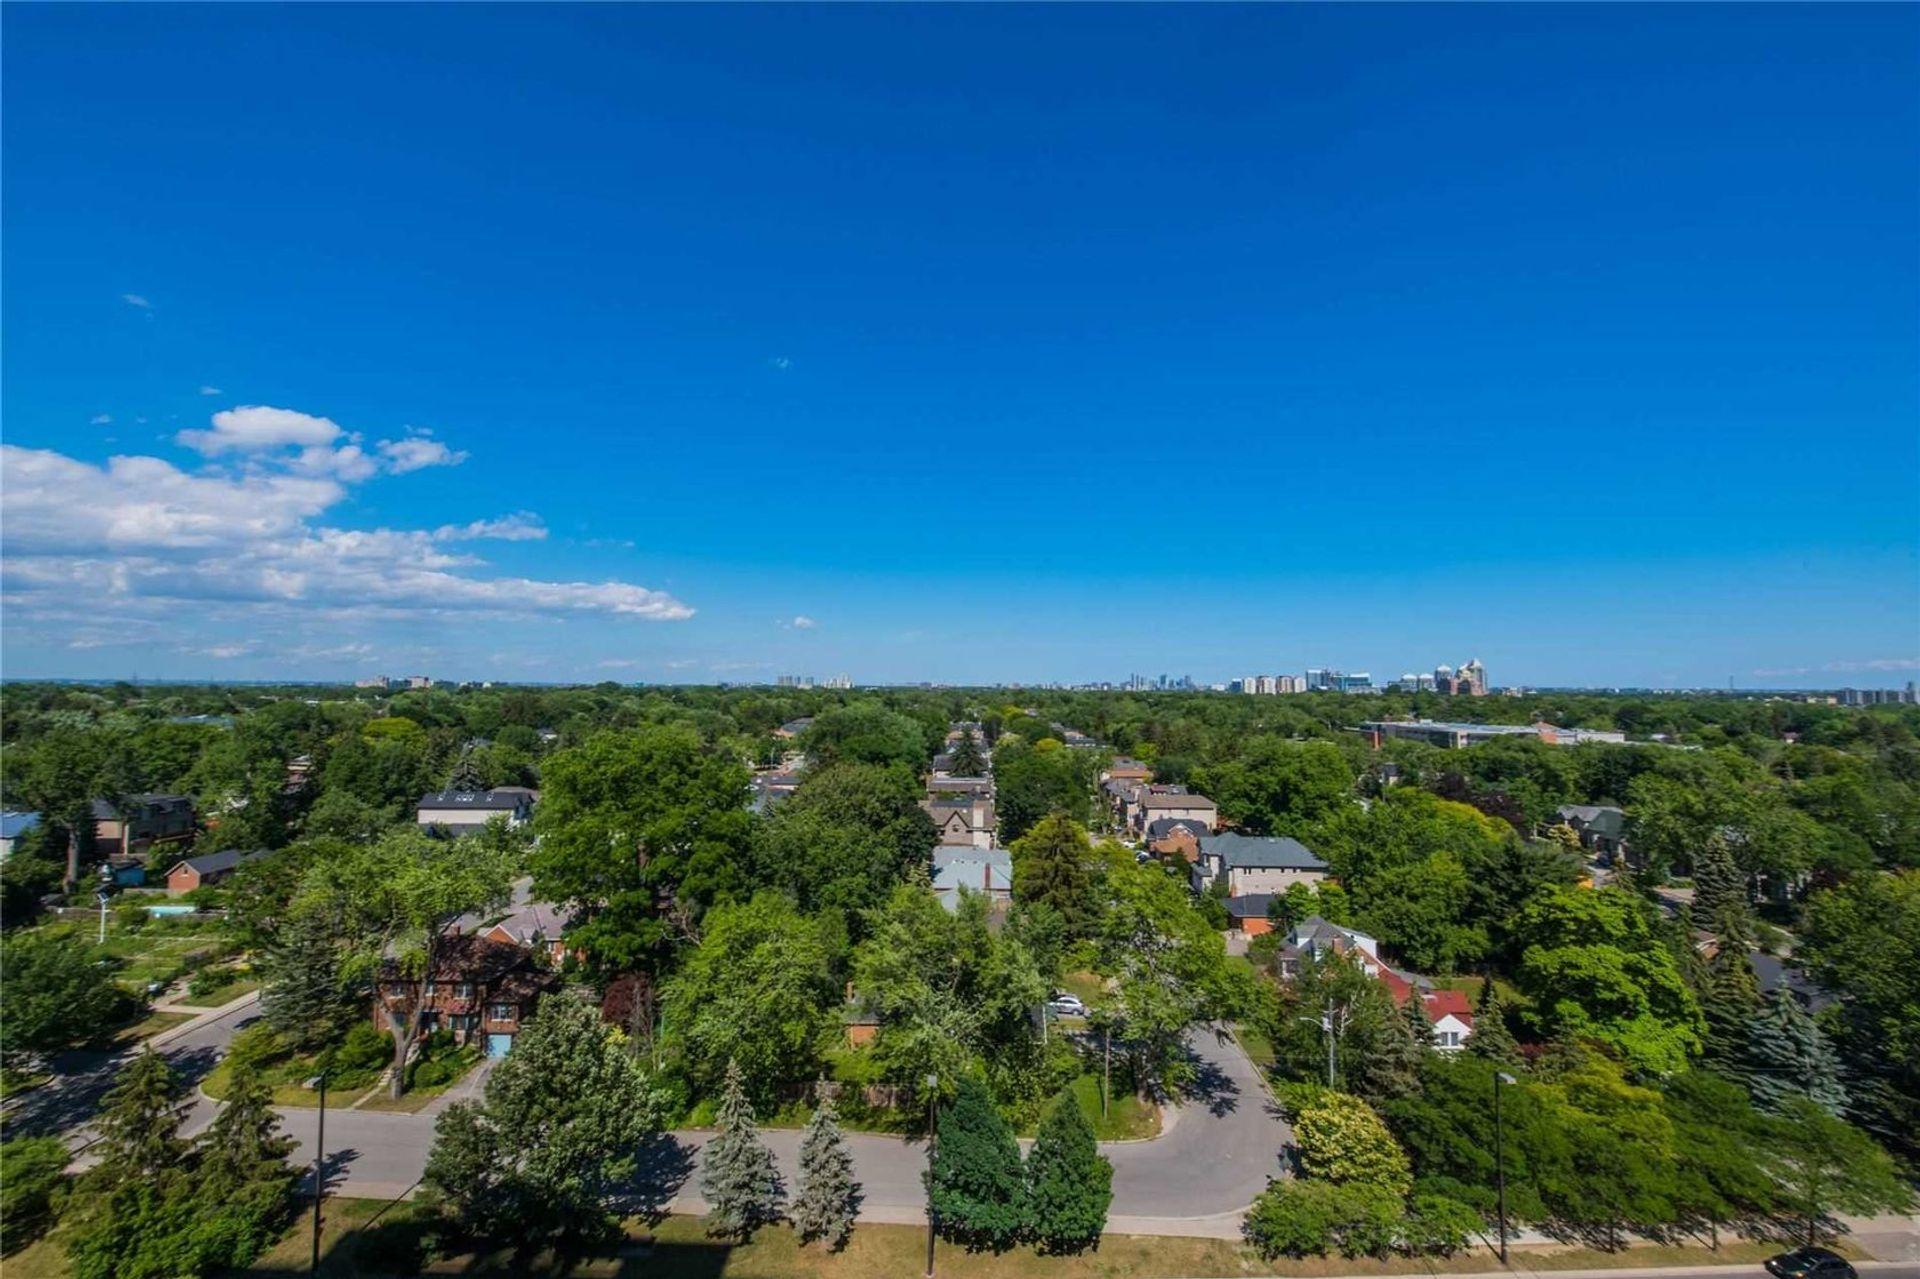 238-doris-ave-willowdale-east-toronto-21 at 1705 - 238 Doris Avenue, Willowdale East, Toronto